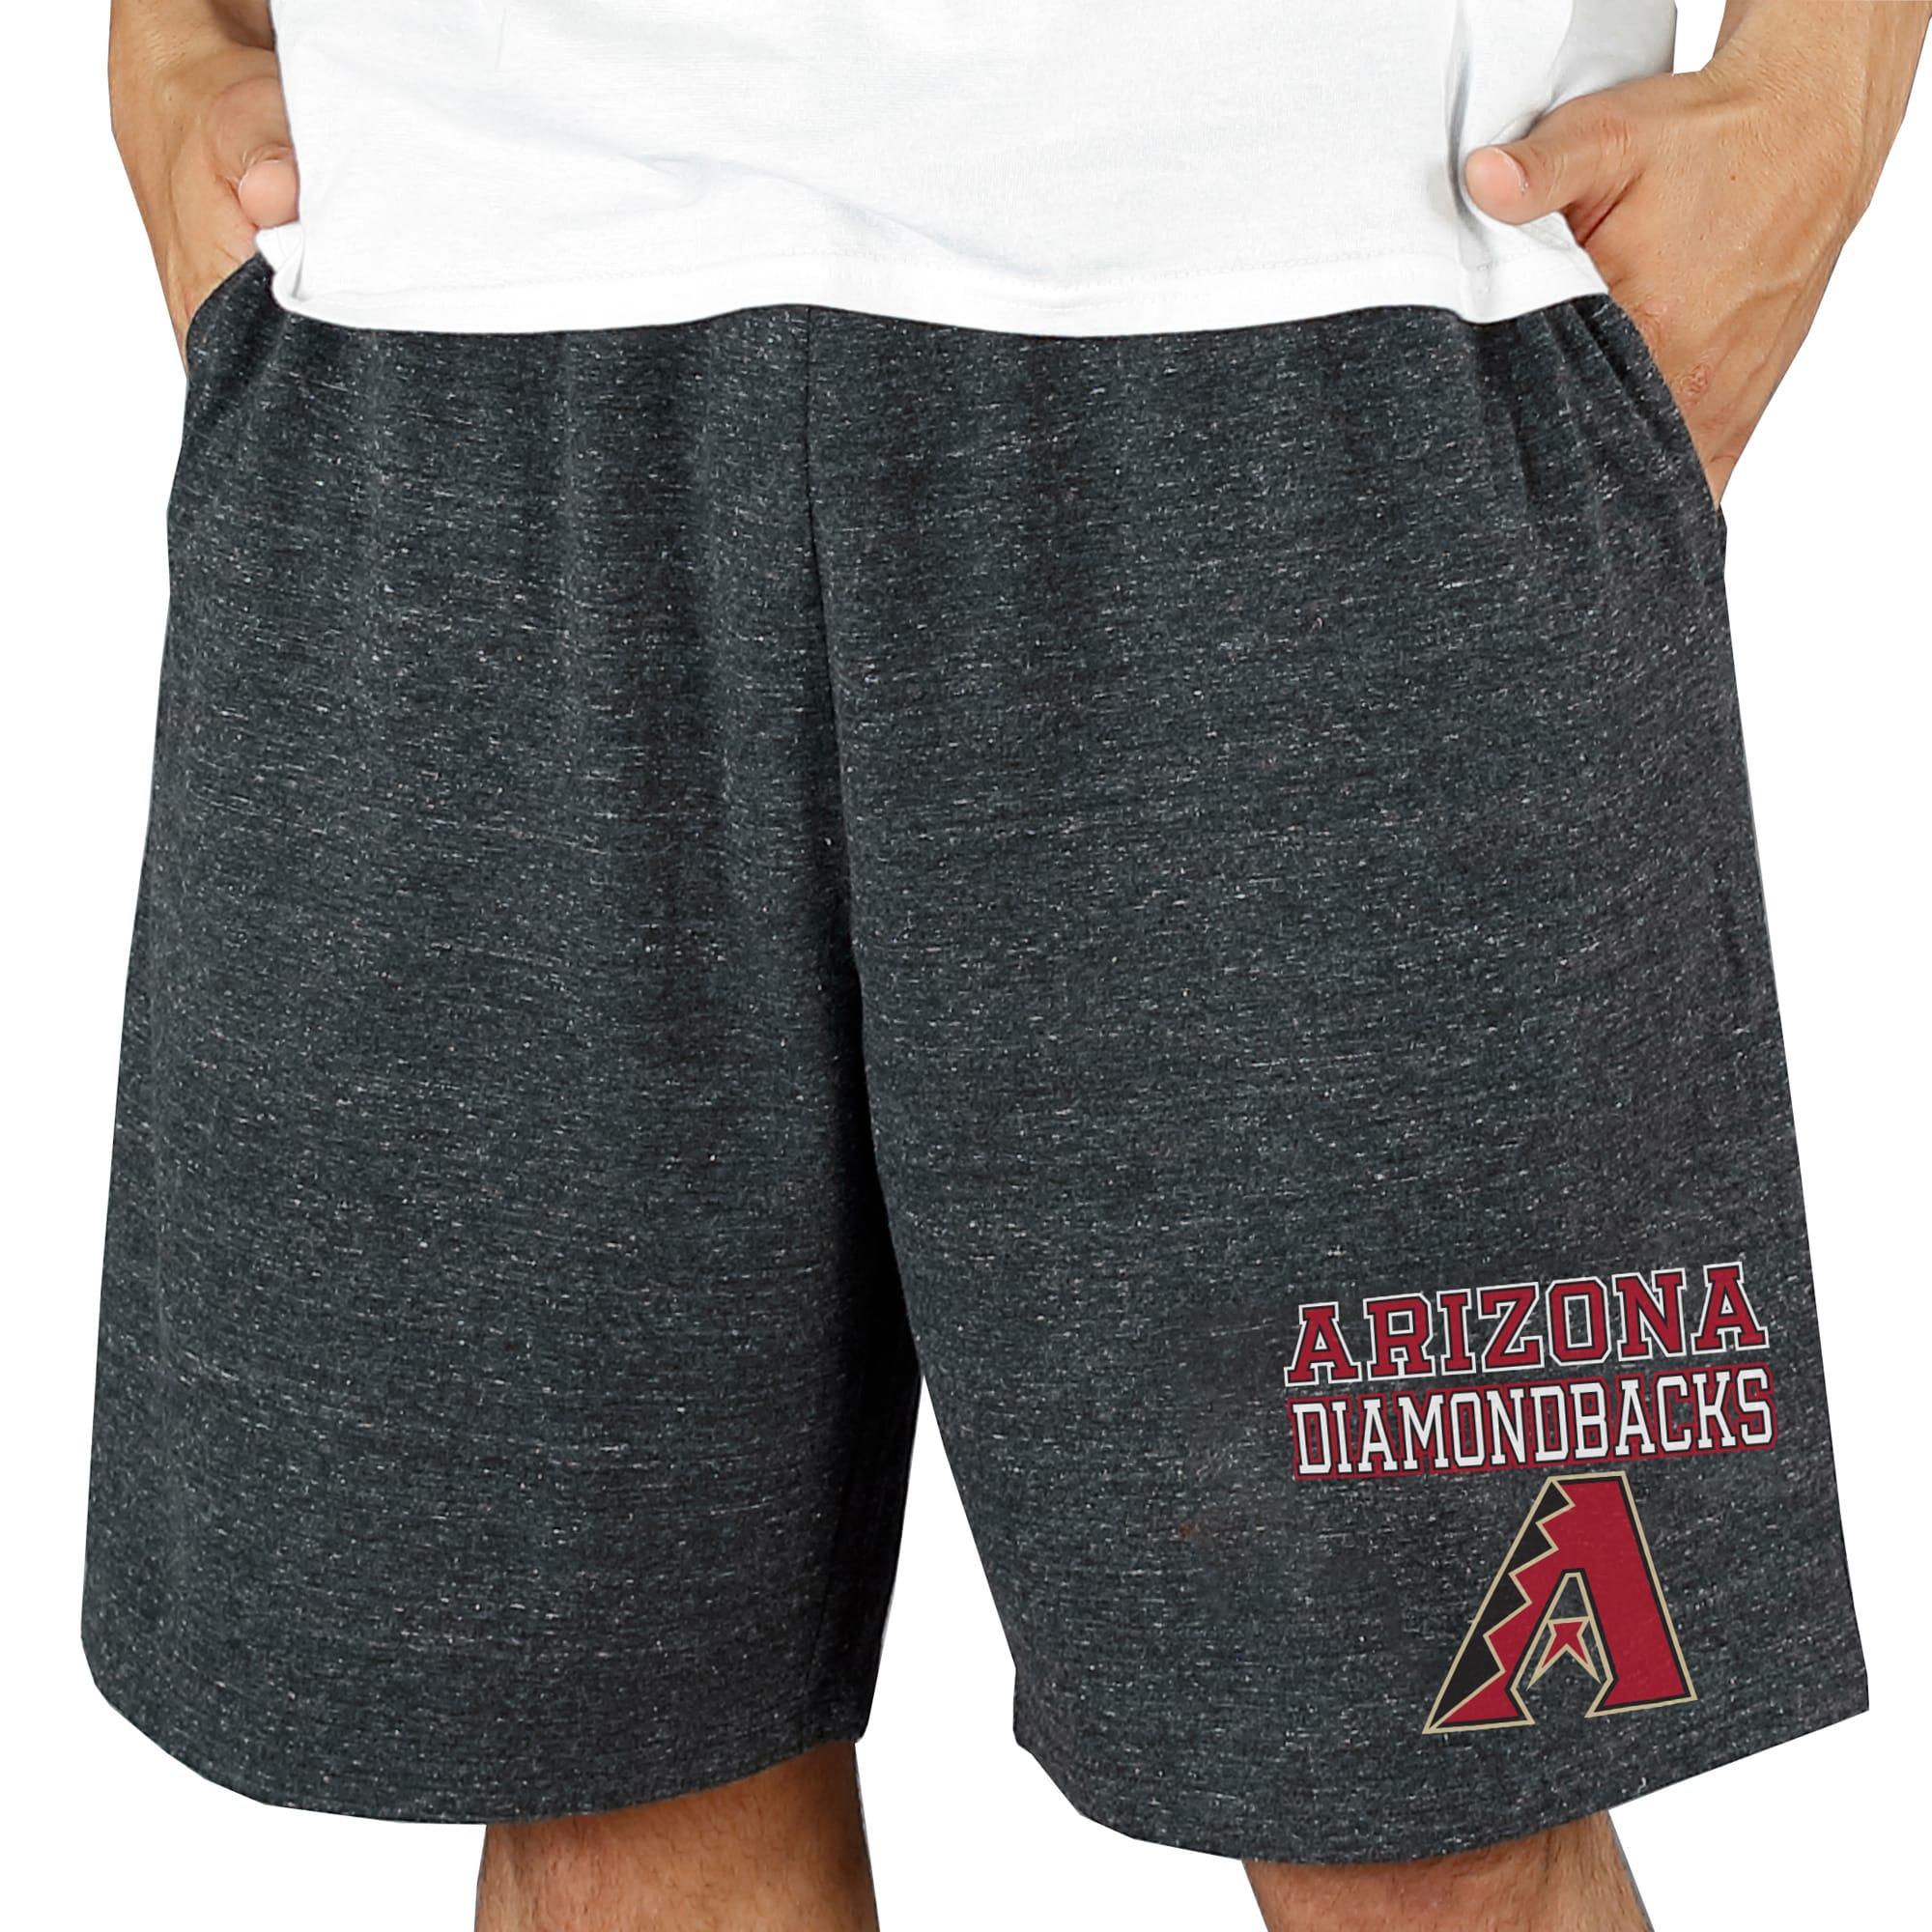 Arizona Diamondbacks Concepts Sport Pitch Knit Jam Shorts - Charcoal